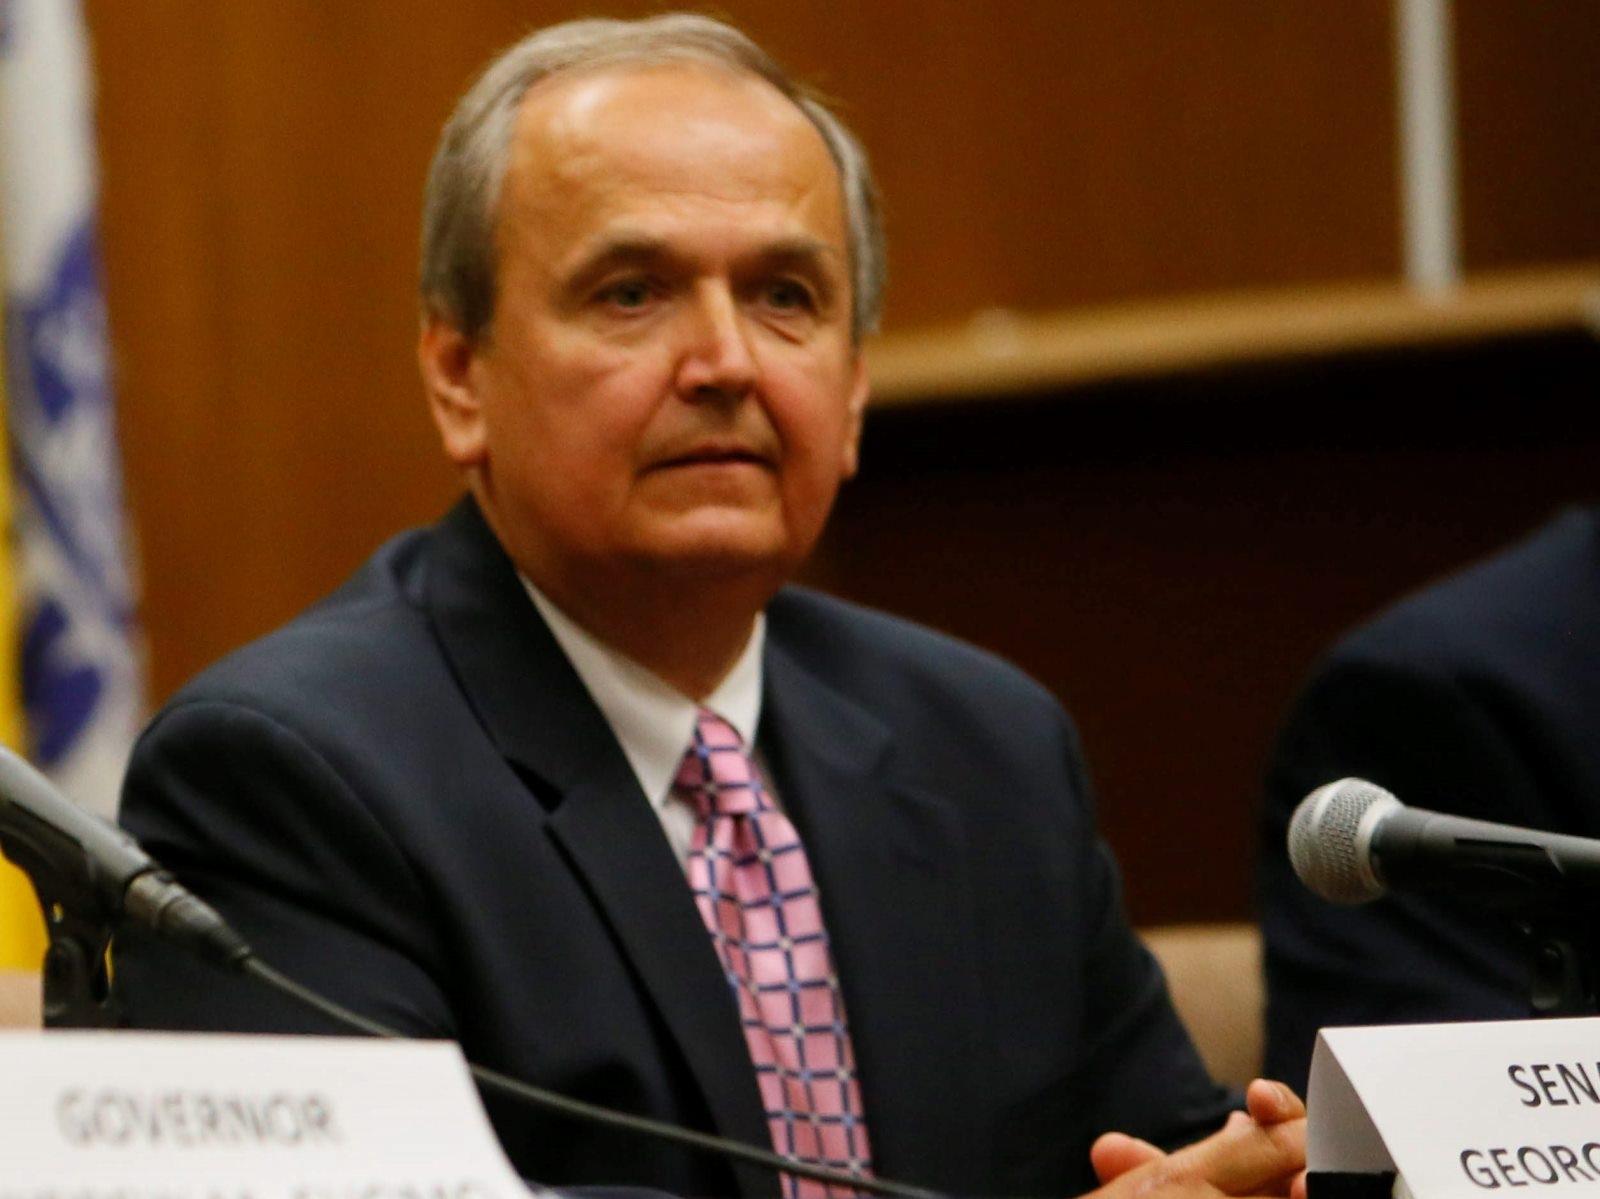 Sen. George D. Maziarz has held seat since 1995.